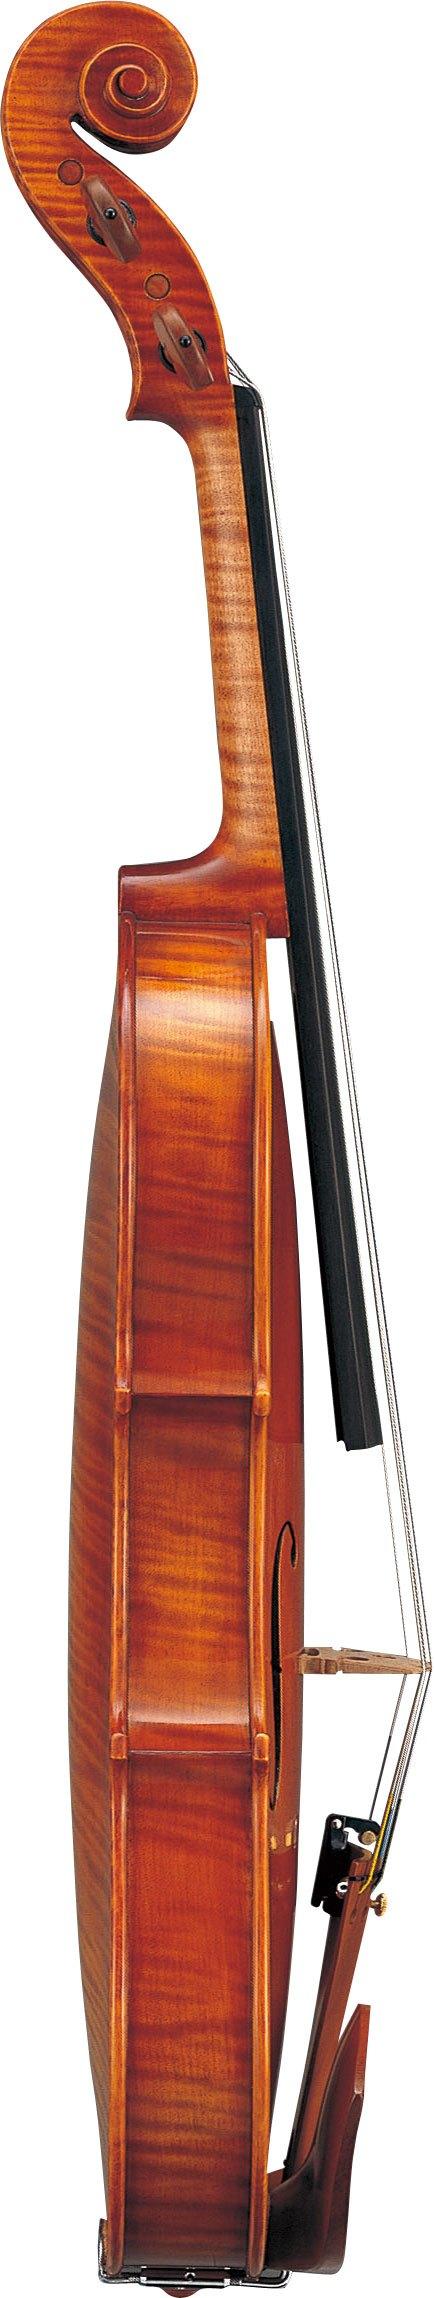 Violín Yamaha V20SG 4/4 Set